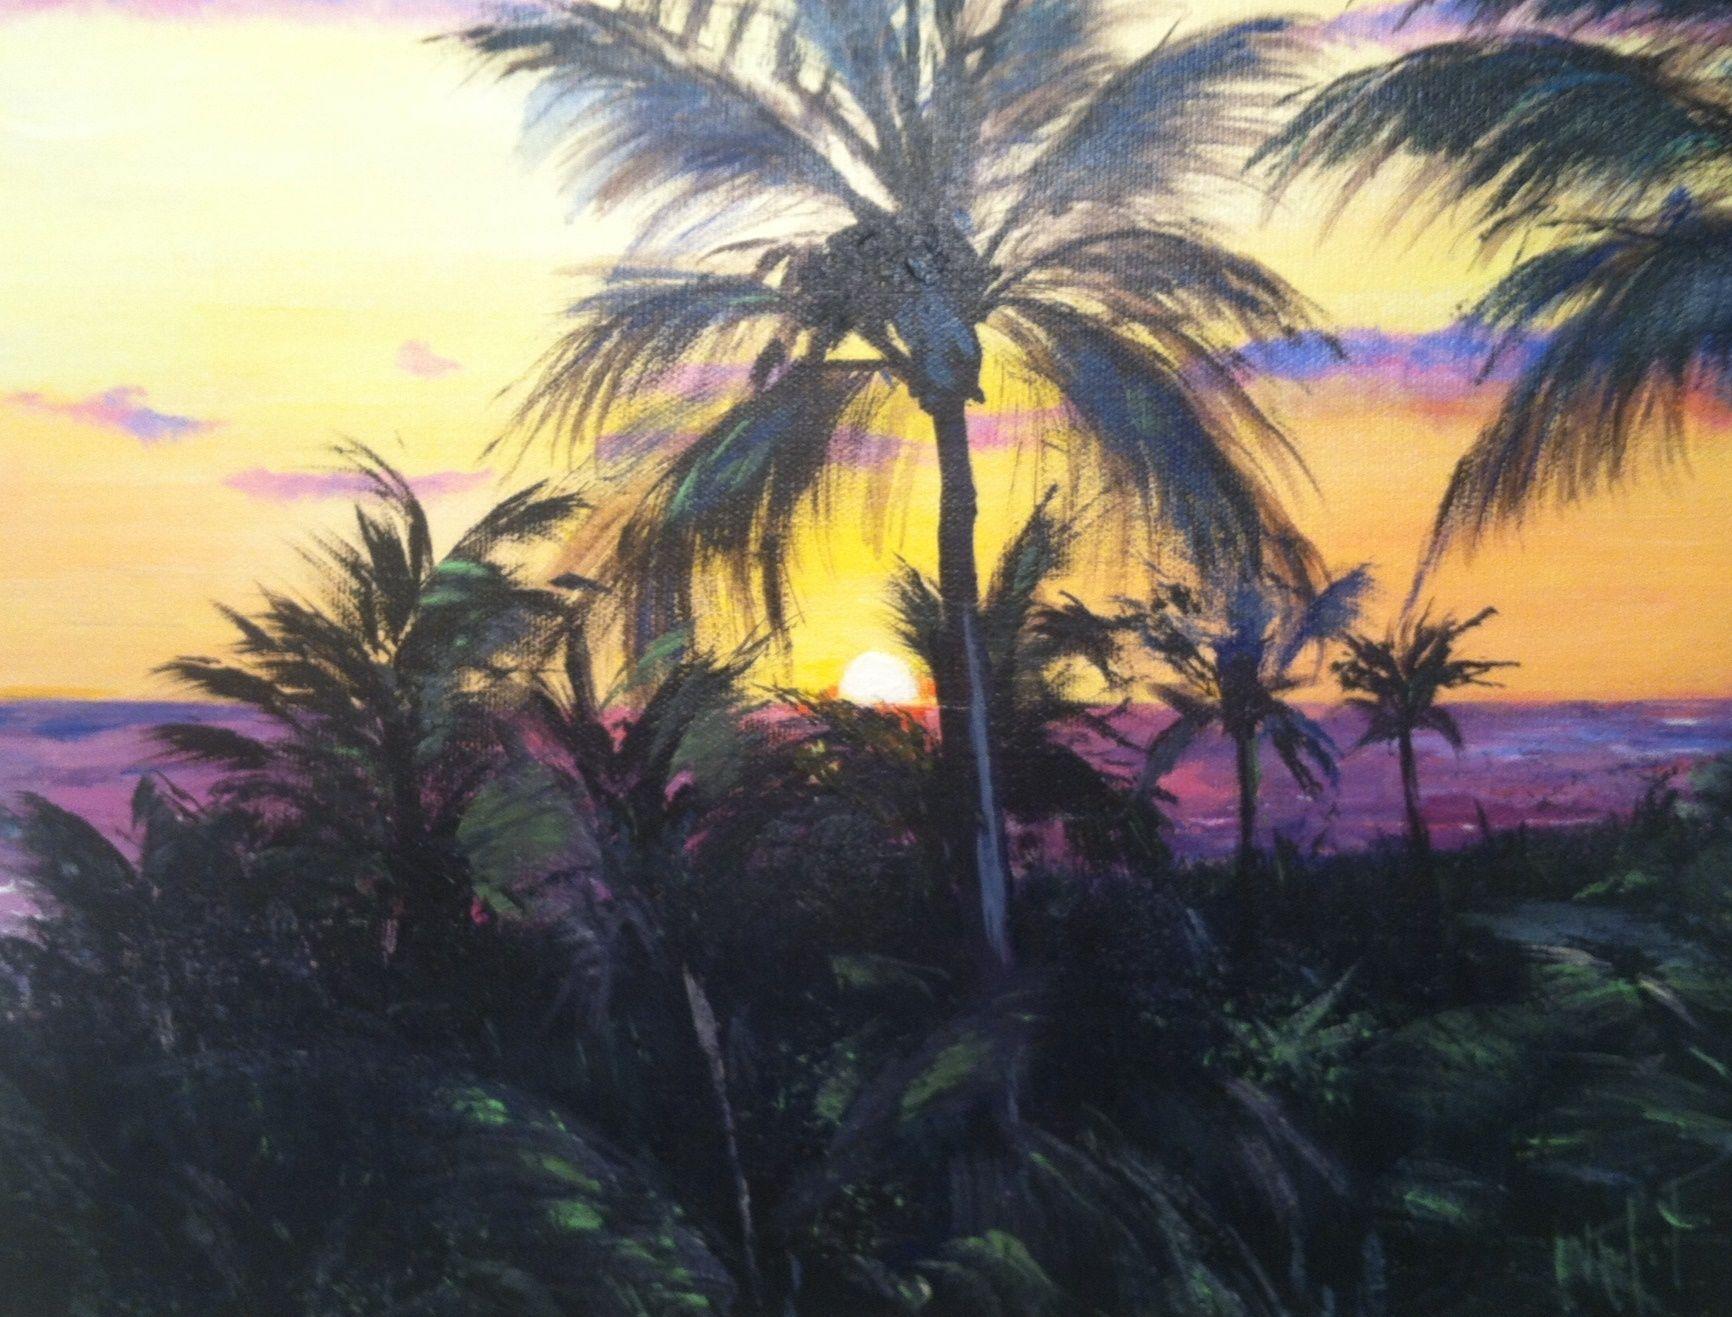 Sanibel Island Sunset (With images) Sanibel island